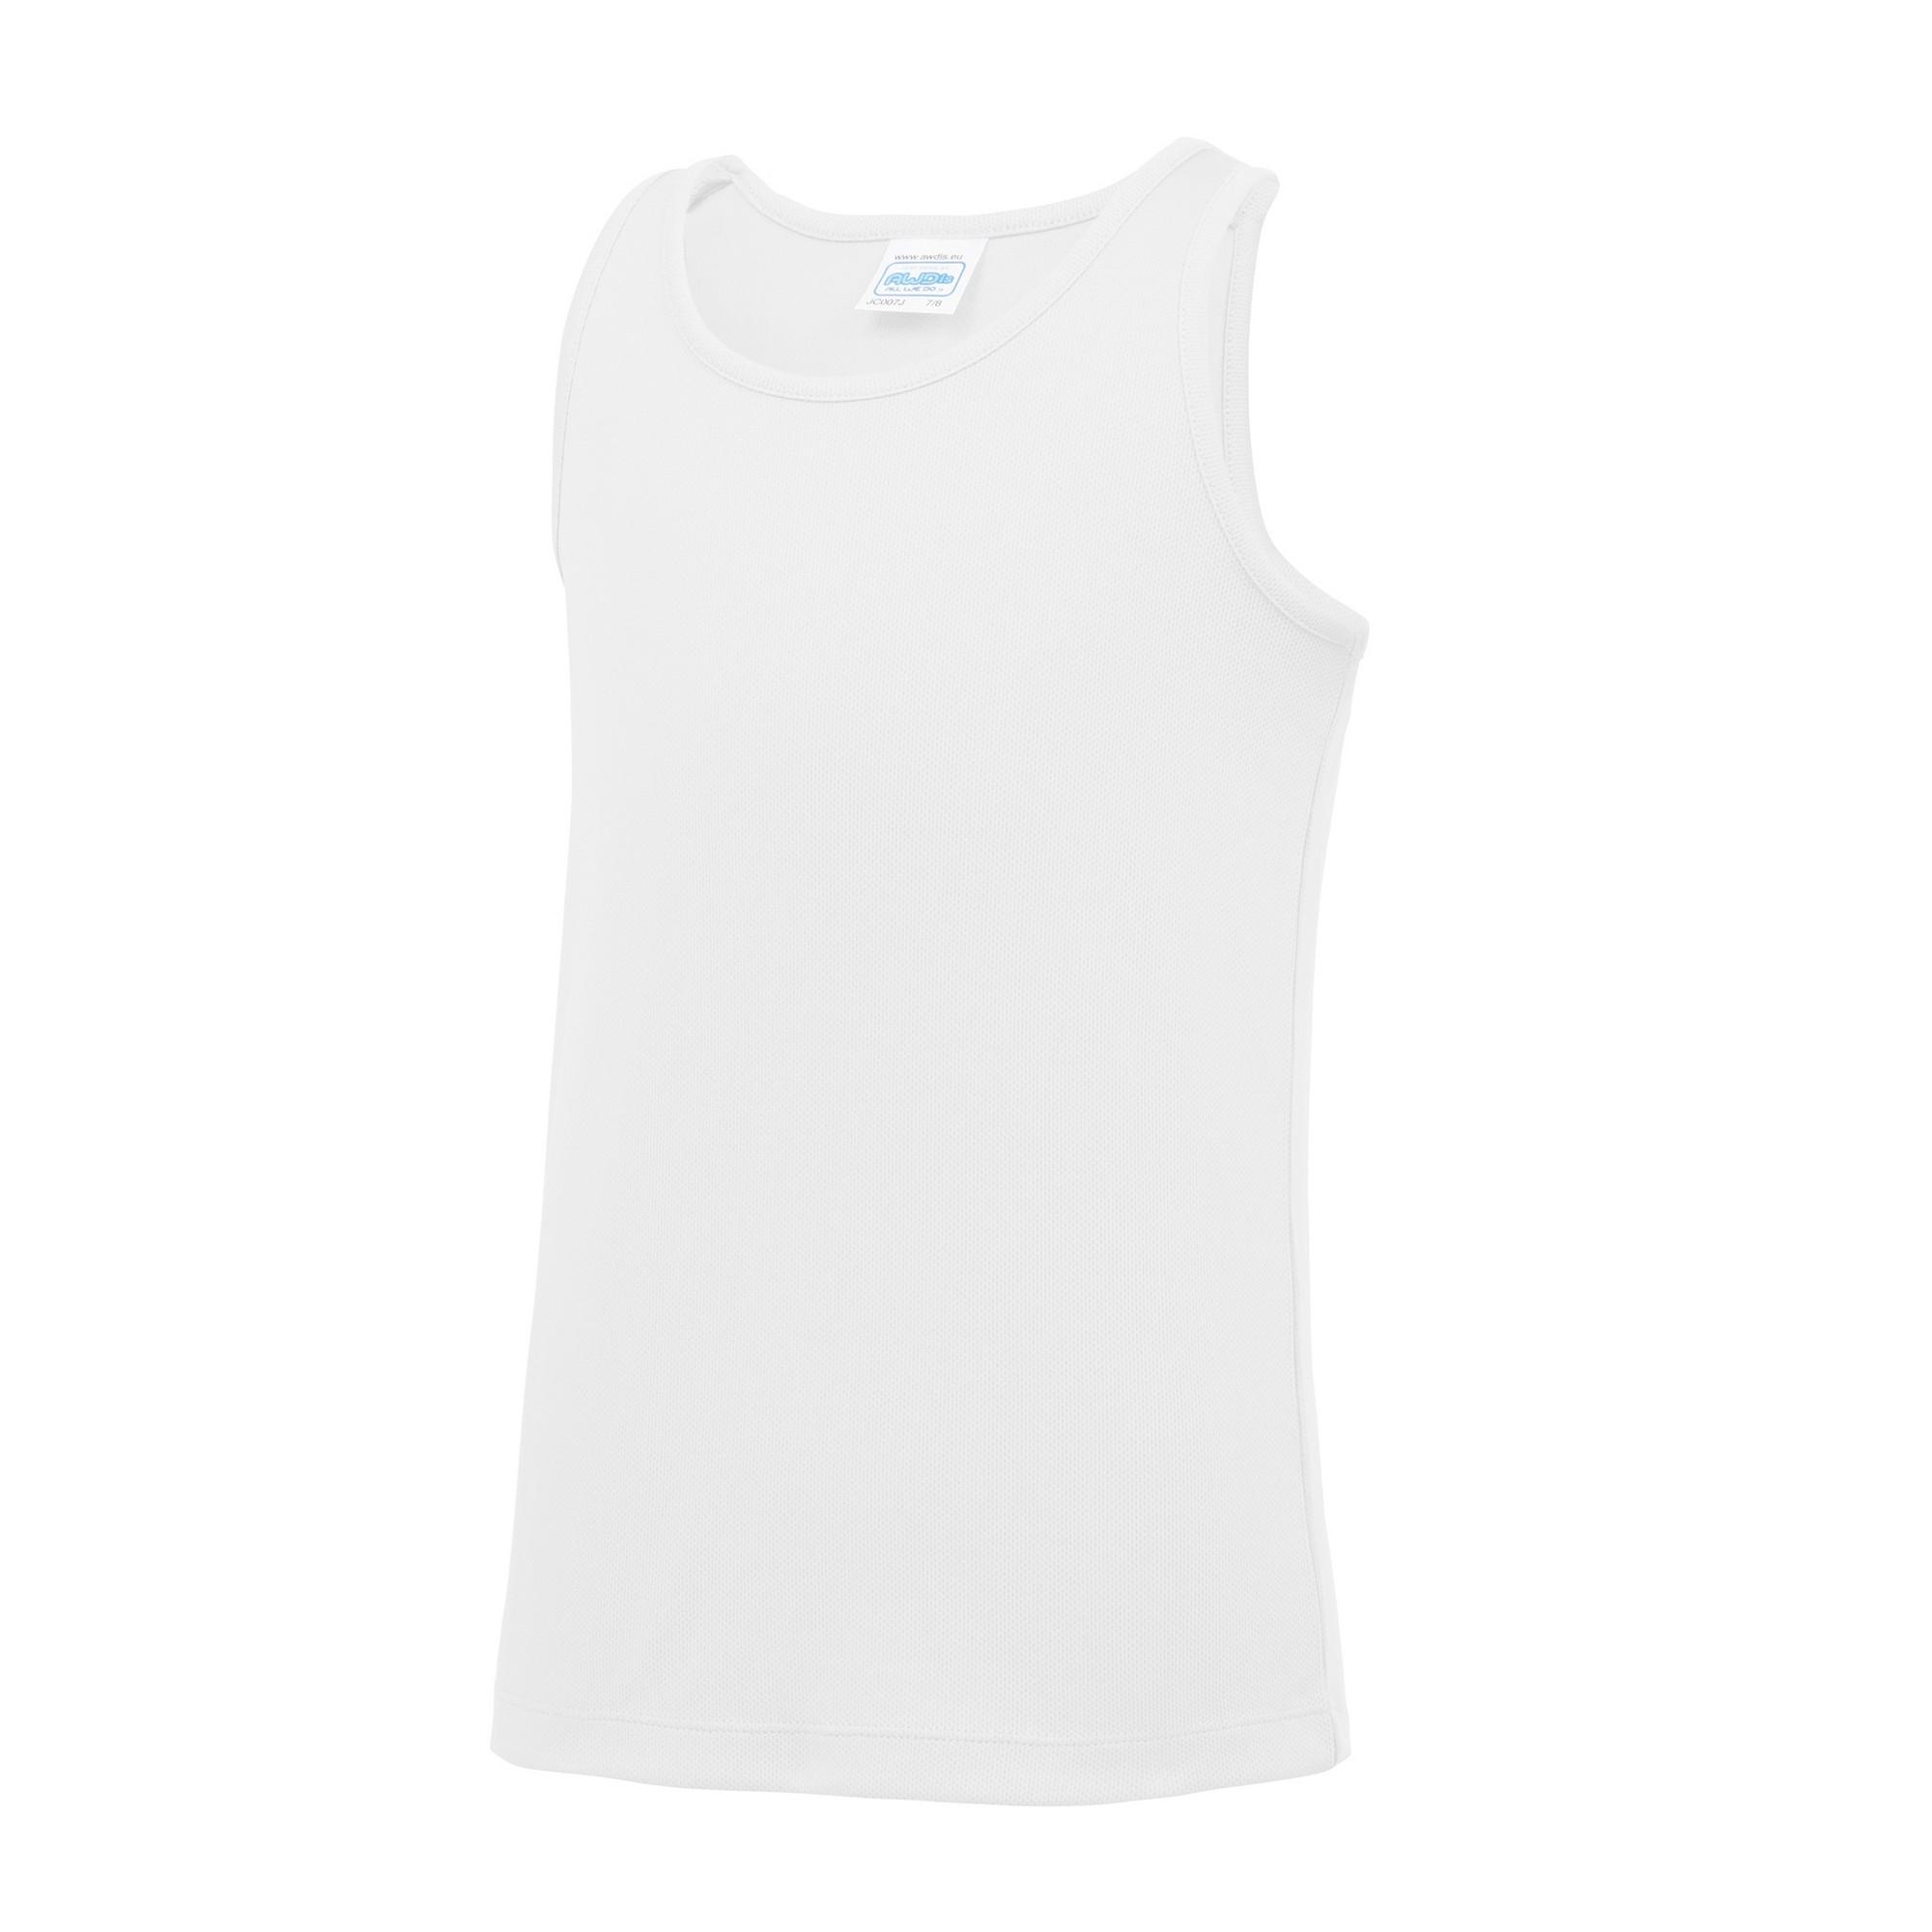 AWDis Childrens//Kids Just Cool Sleeveless Vest Top 5-6 Years Jet Black